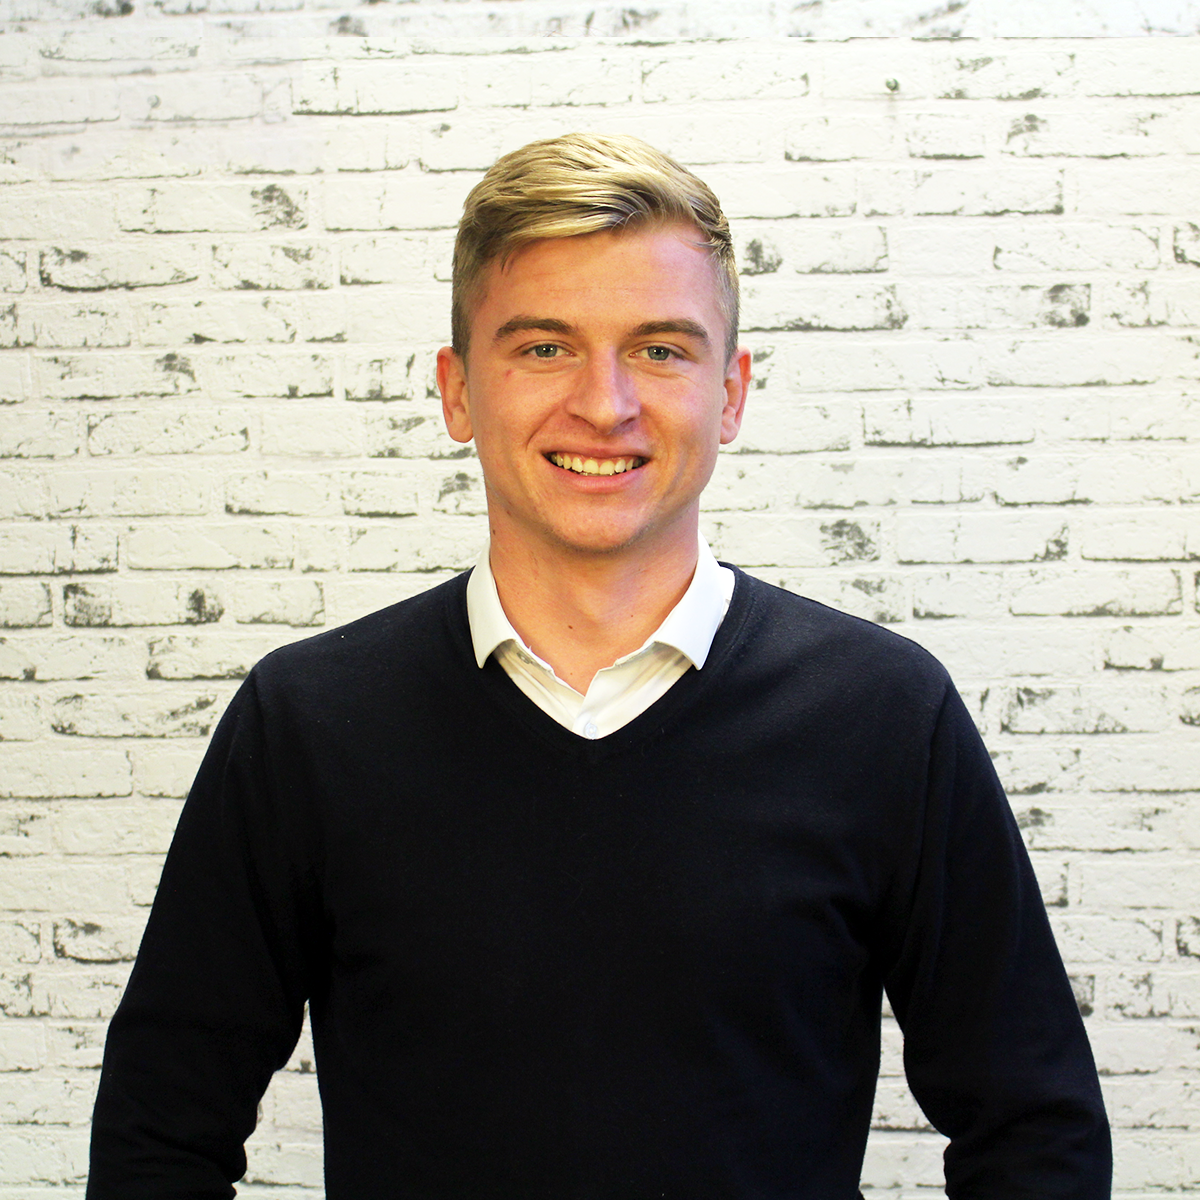 Charlie Hunt: Business Development Manager at Fleximize